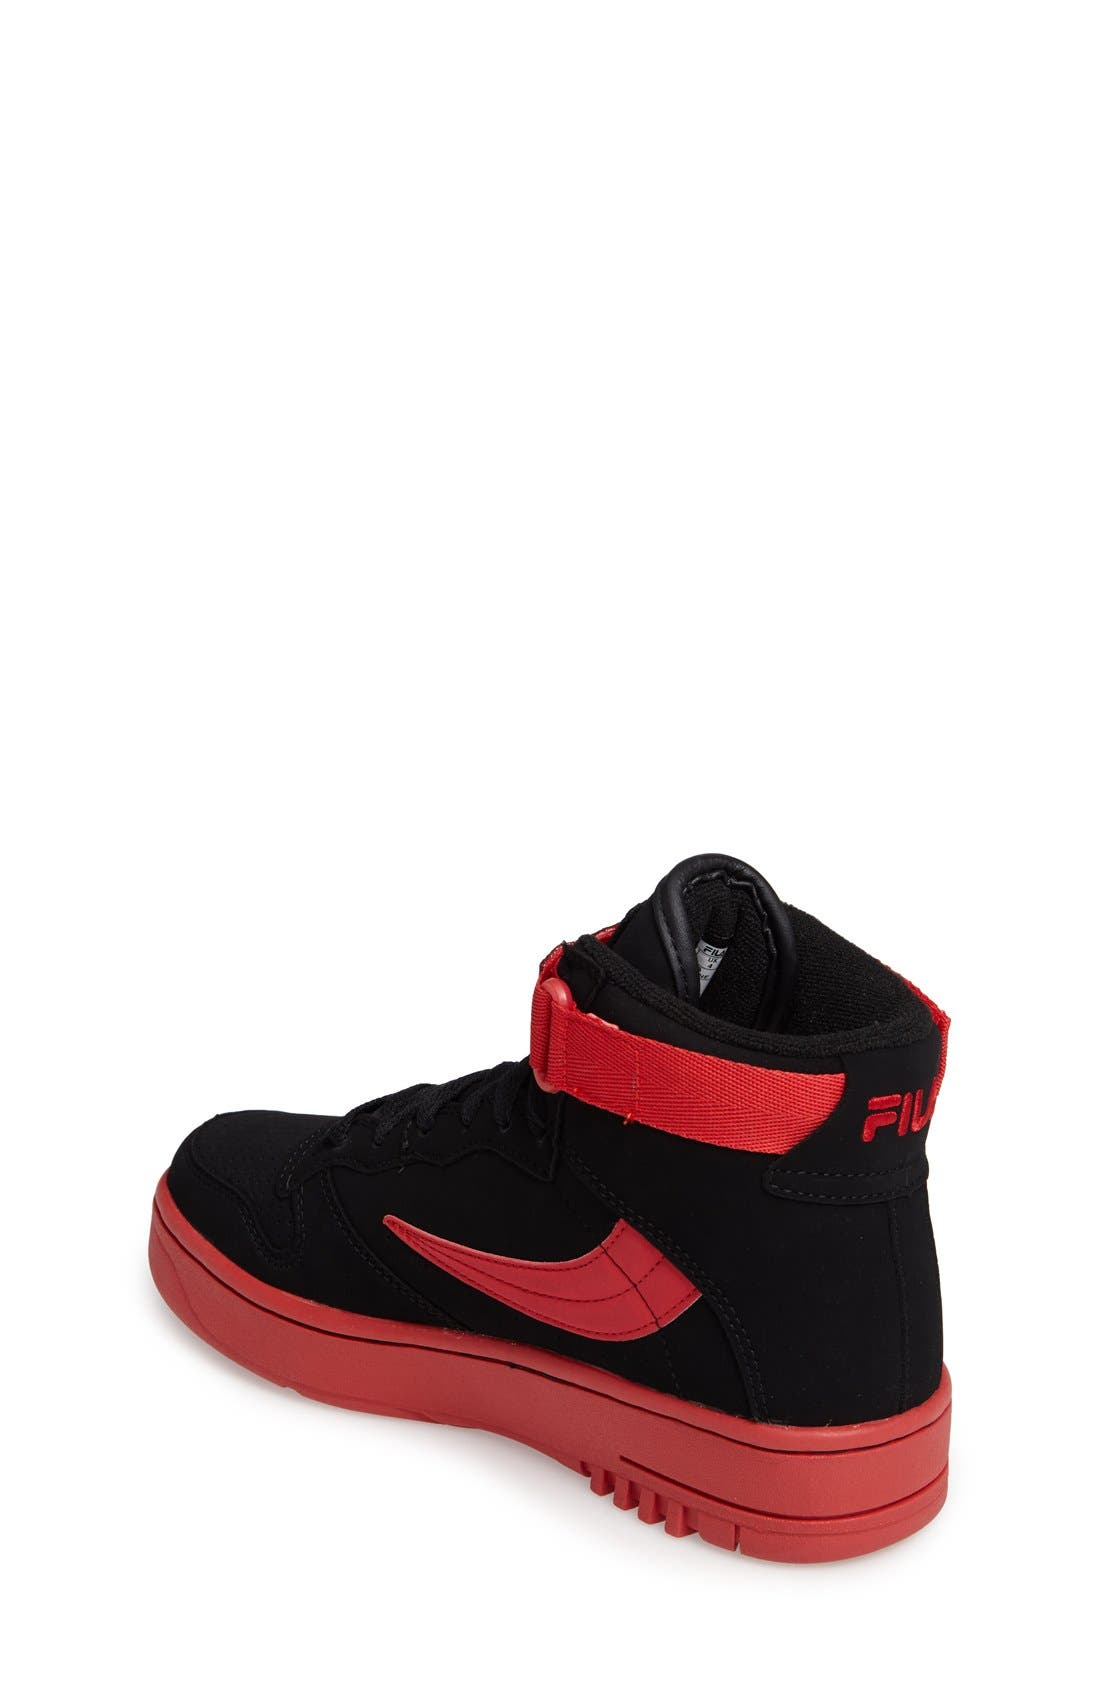 USA FX-100 High Top Sneaker,                             Alternate thumbnail 7, color,                             001